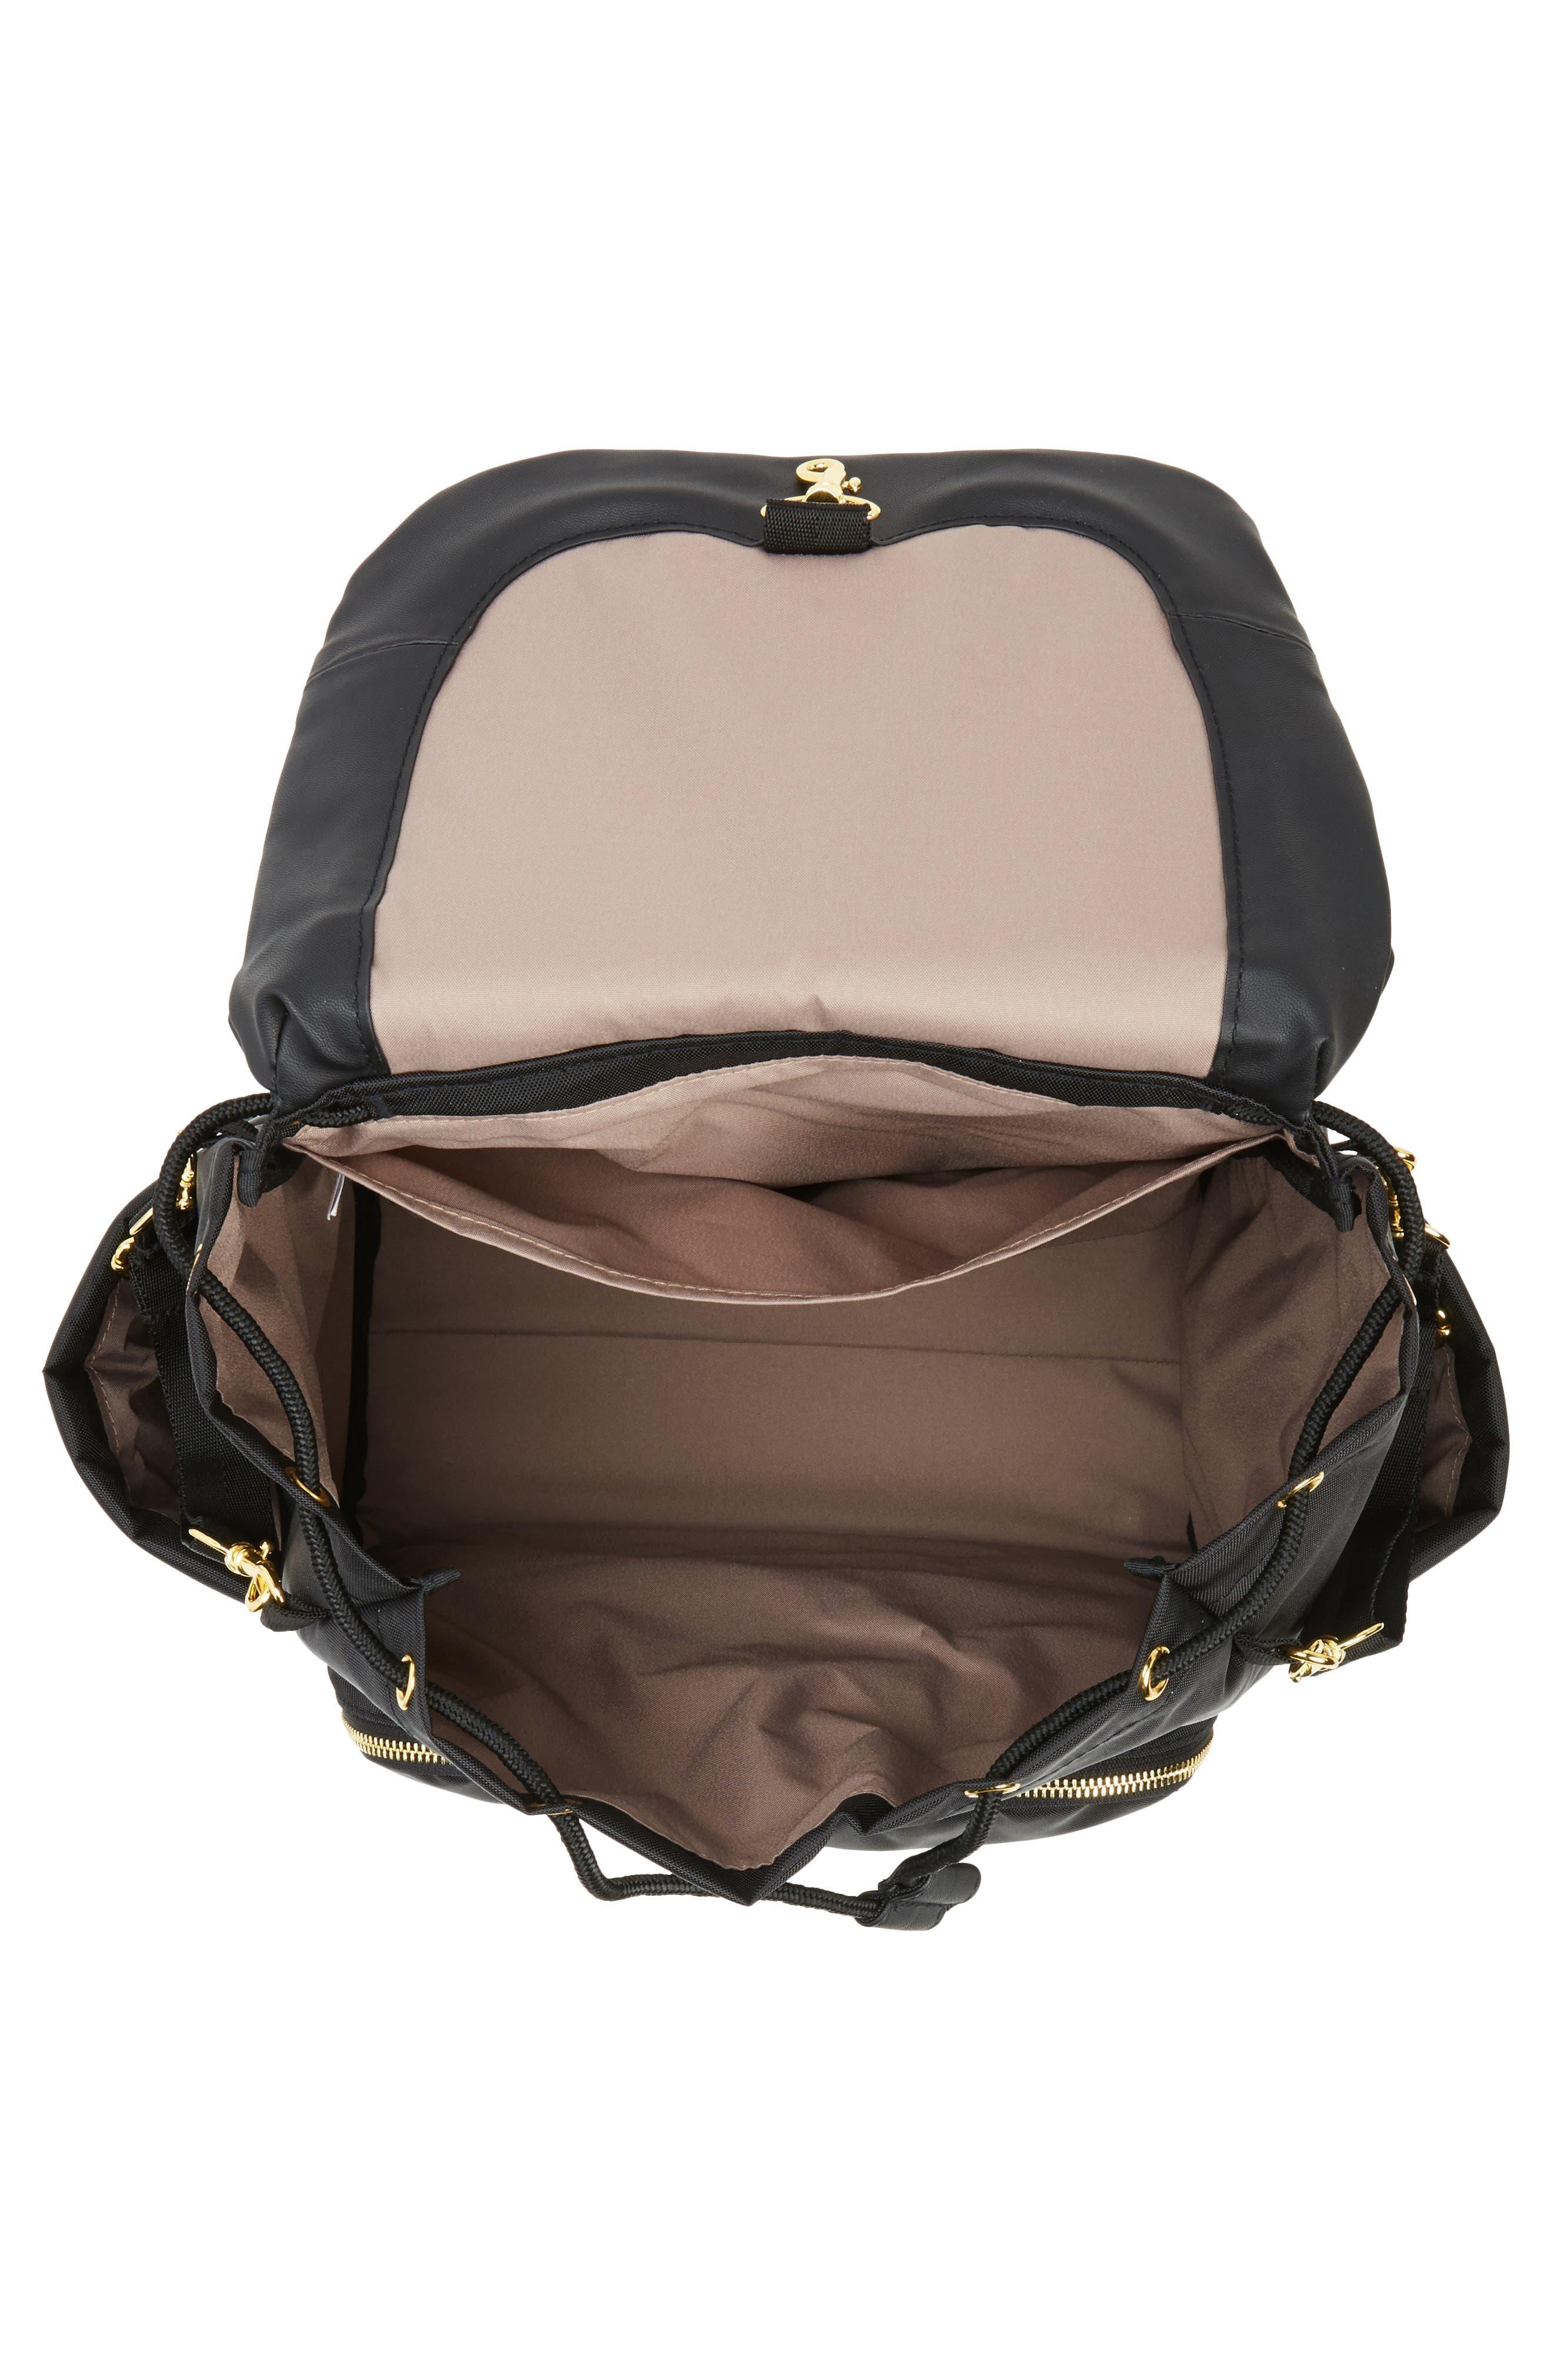 'Chelsea' Diaper Bag Backpack,                             Alternate thumbnail 4, color,                             BLACK